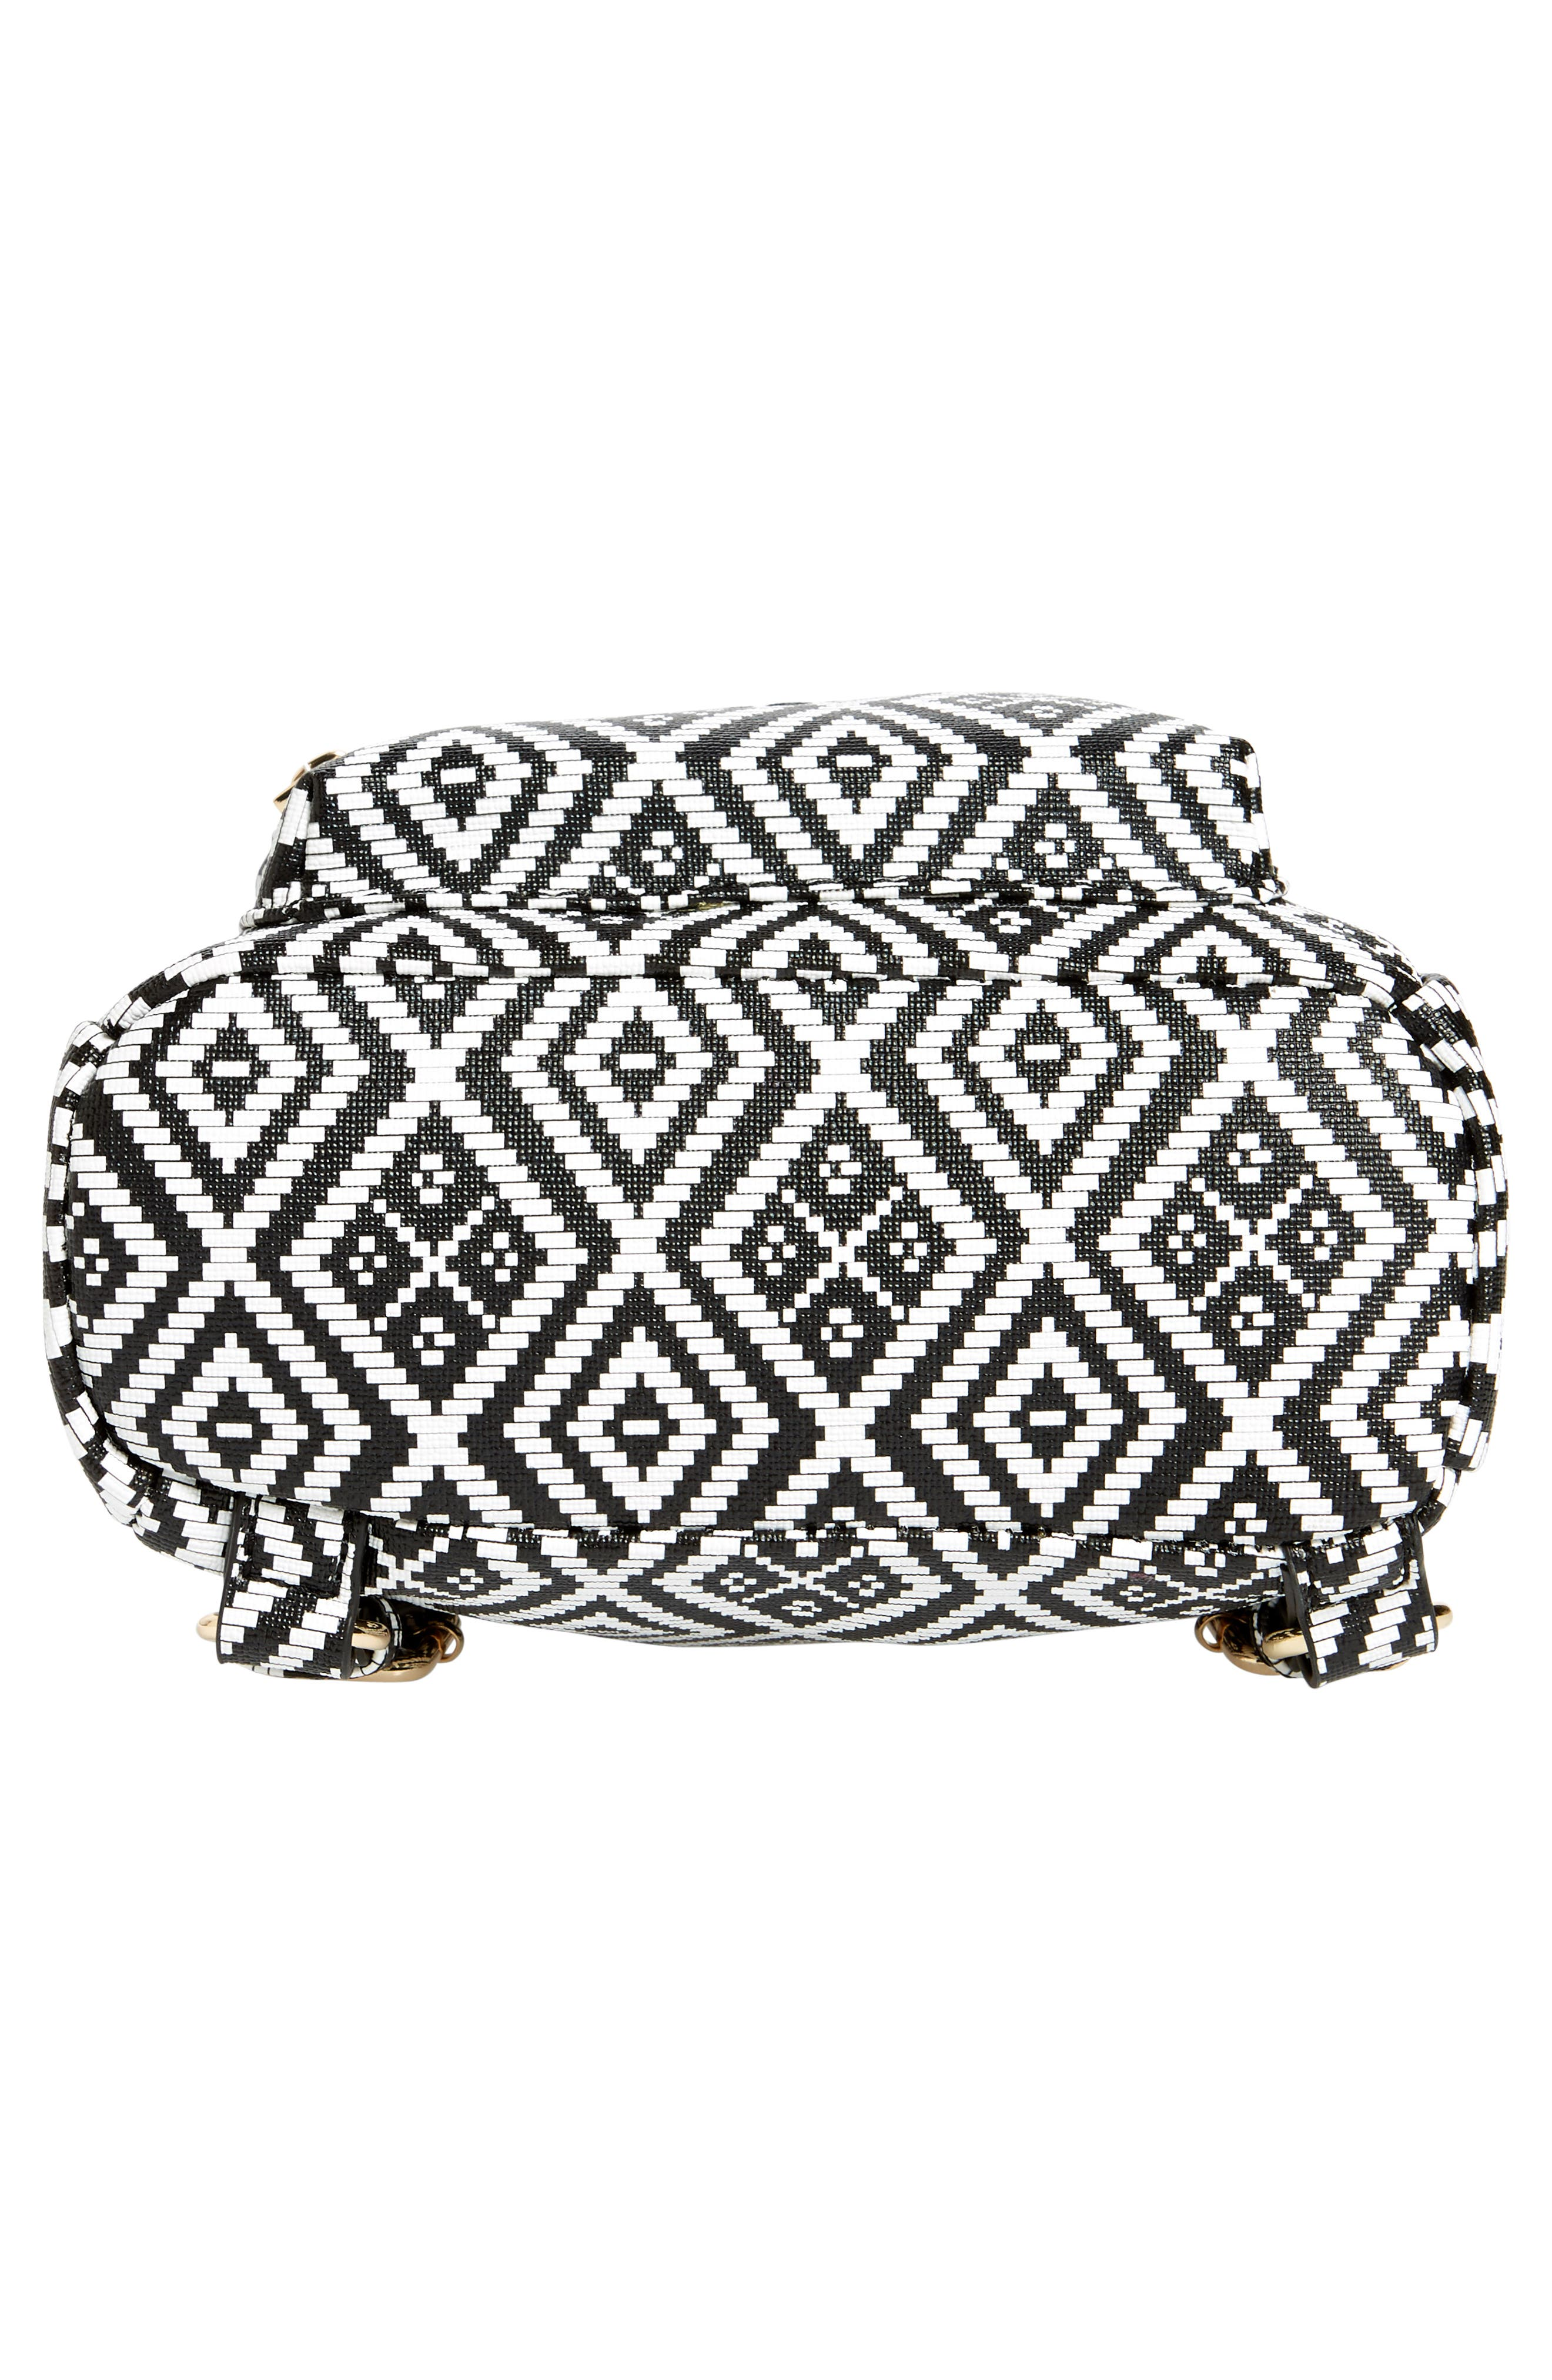 Weave Pattern Faux Leather Mini Backpack,                             Alternate thumbnail 5, color,                             Black/ White